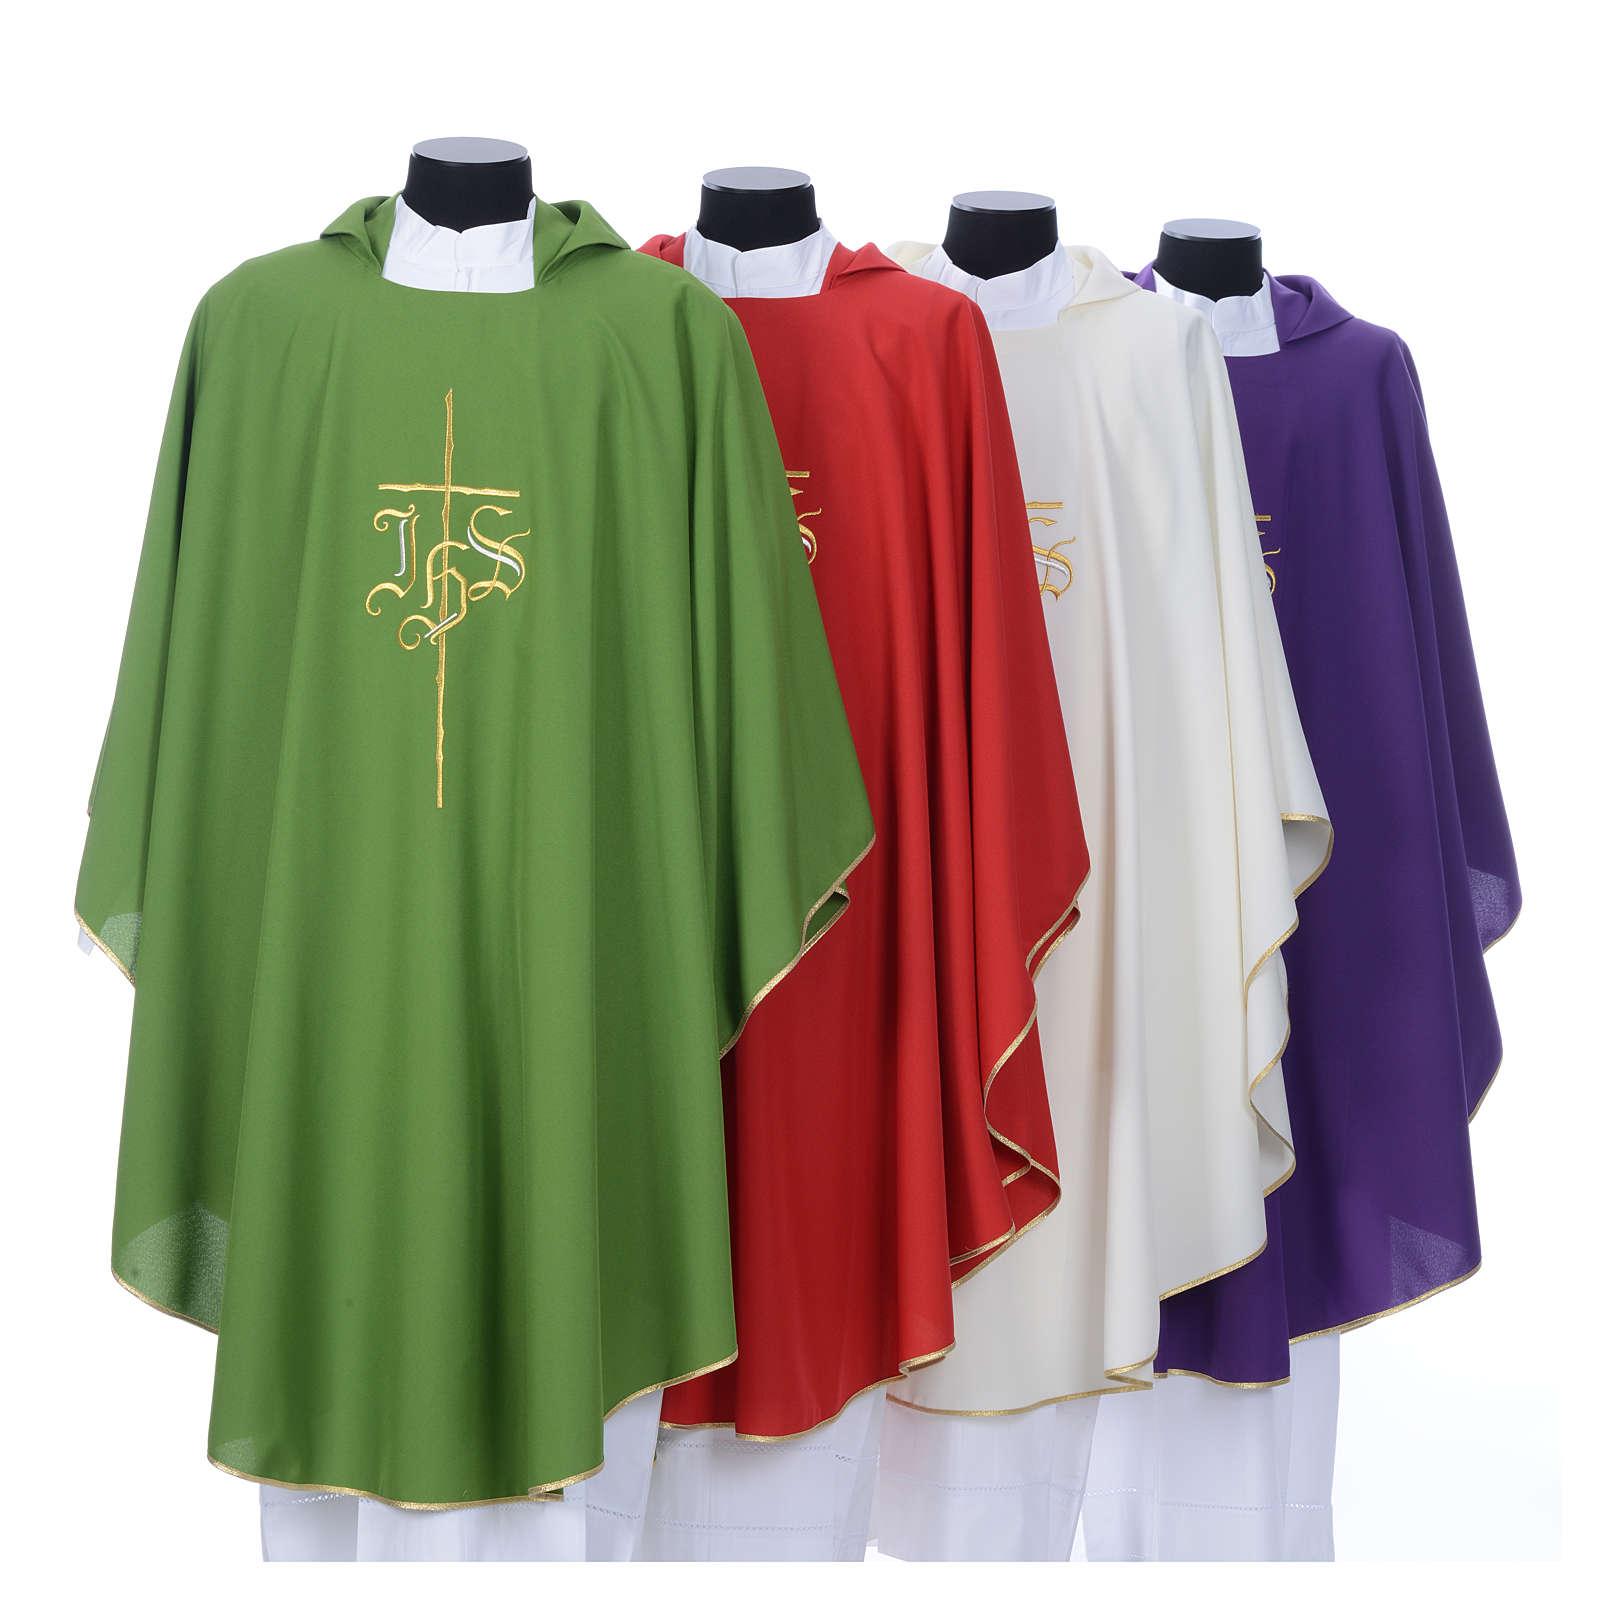 Casula poliéster IHS cruz estilizada 4 cores 4